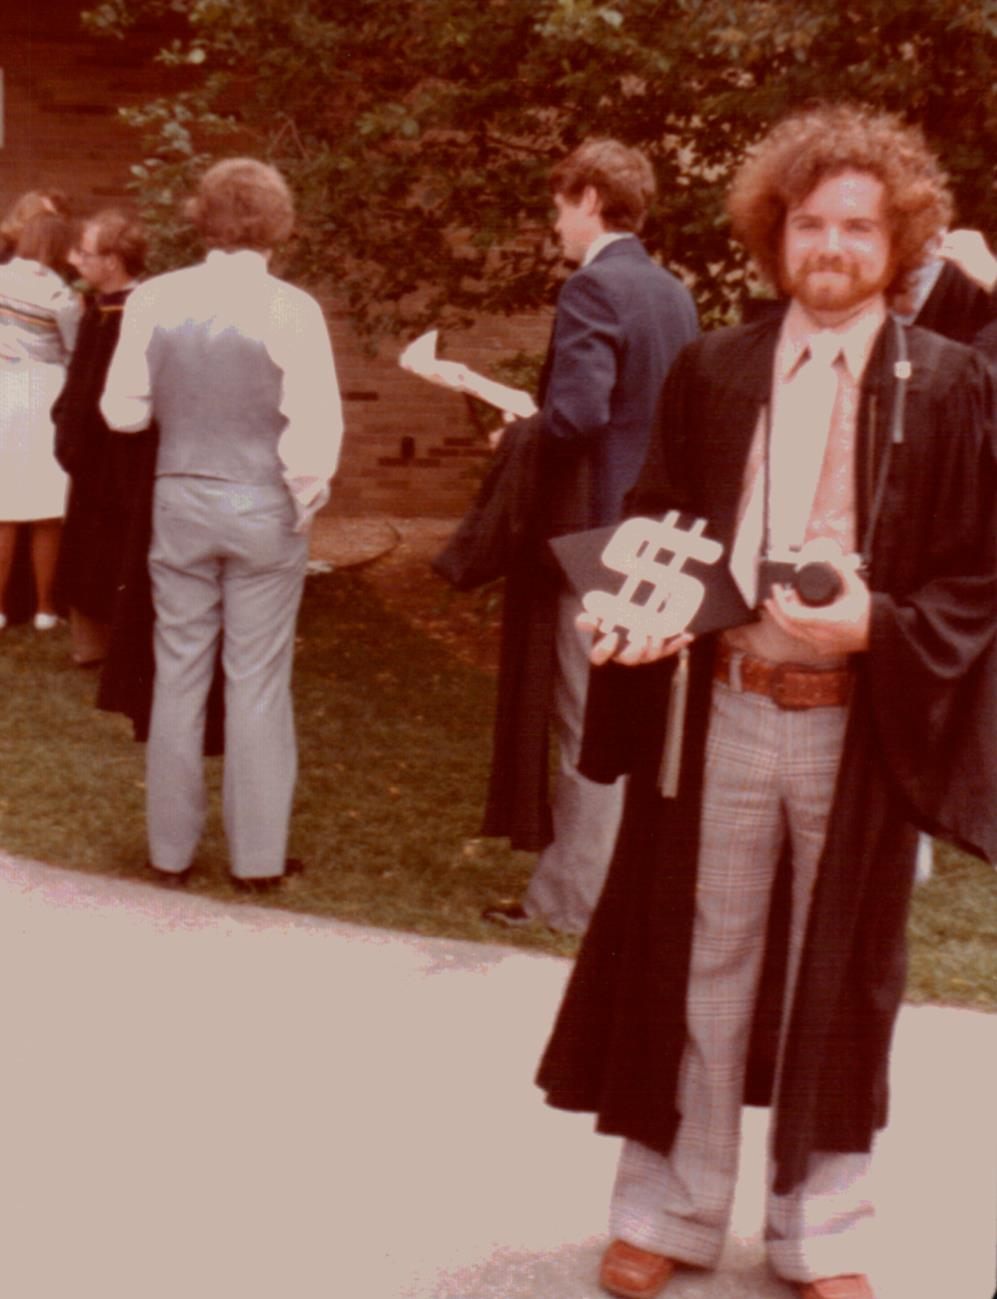 graduation picture of my dad and pesto hummus